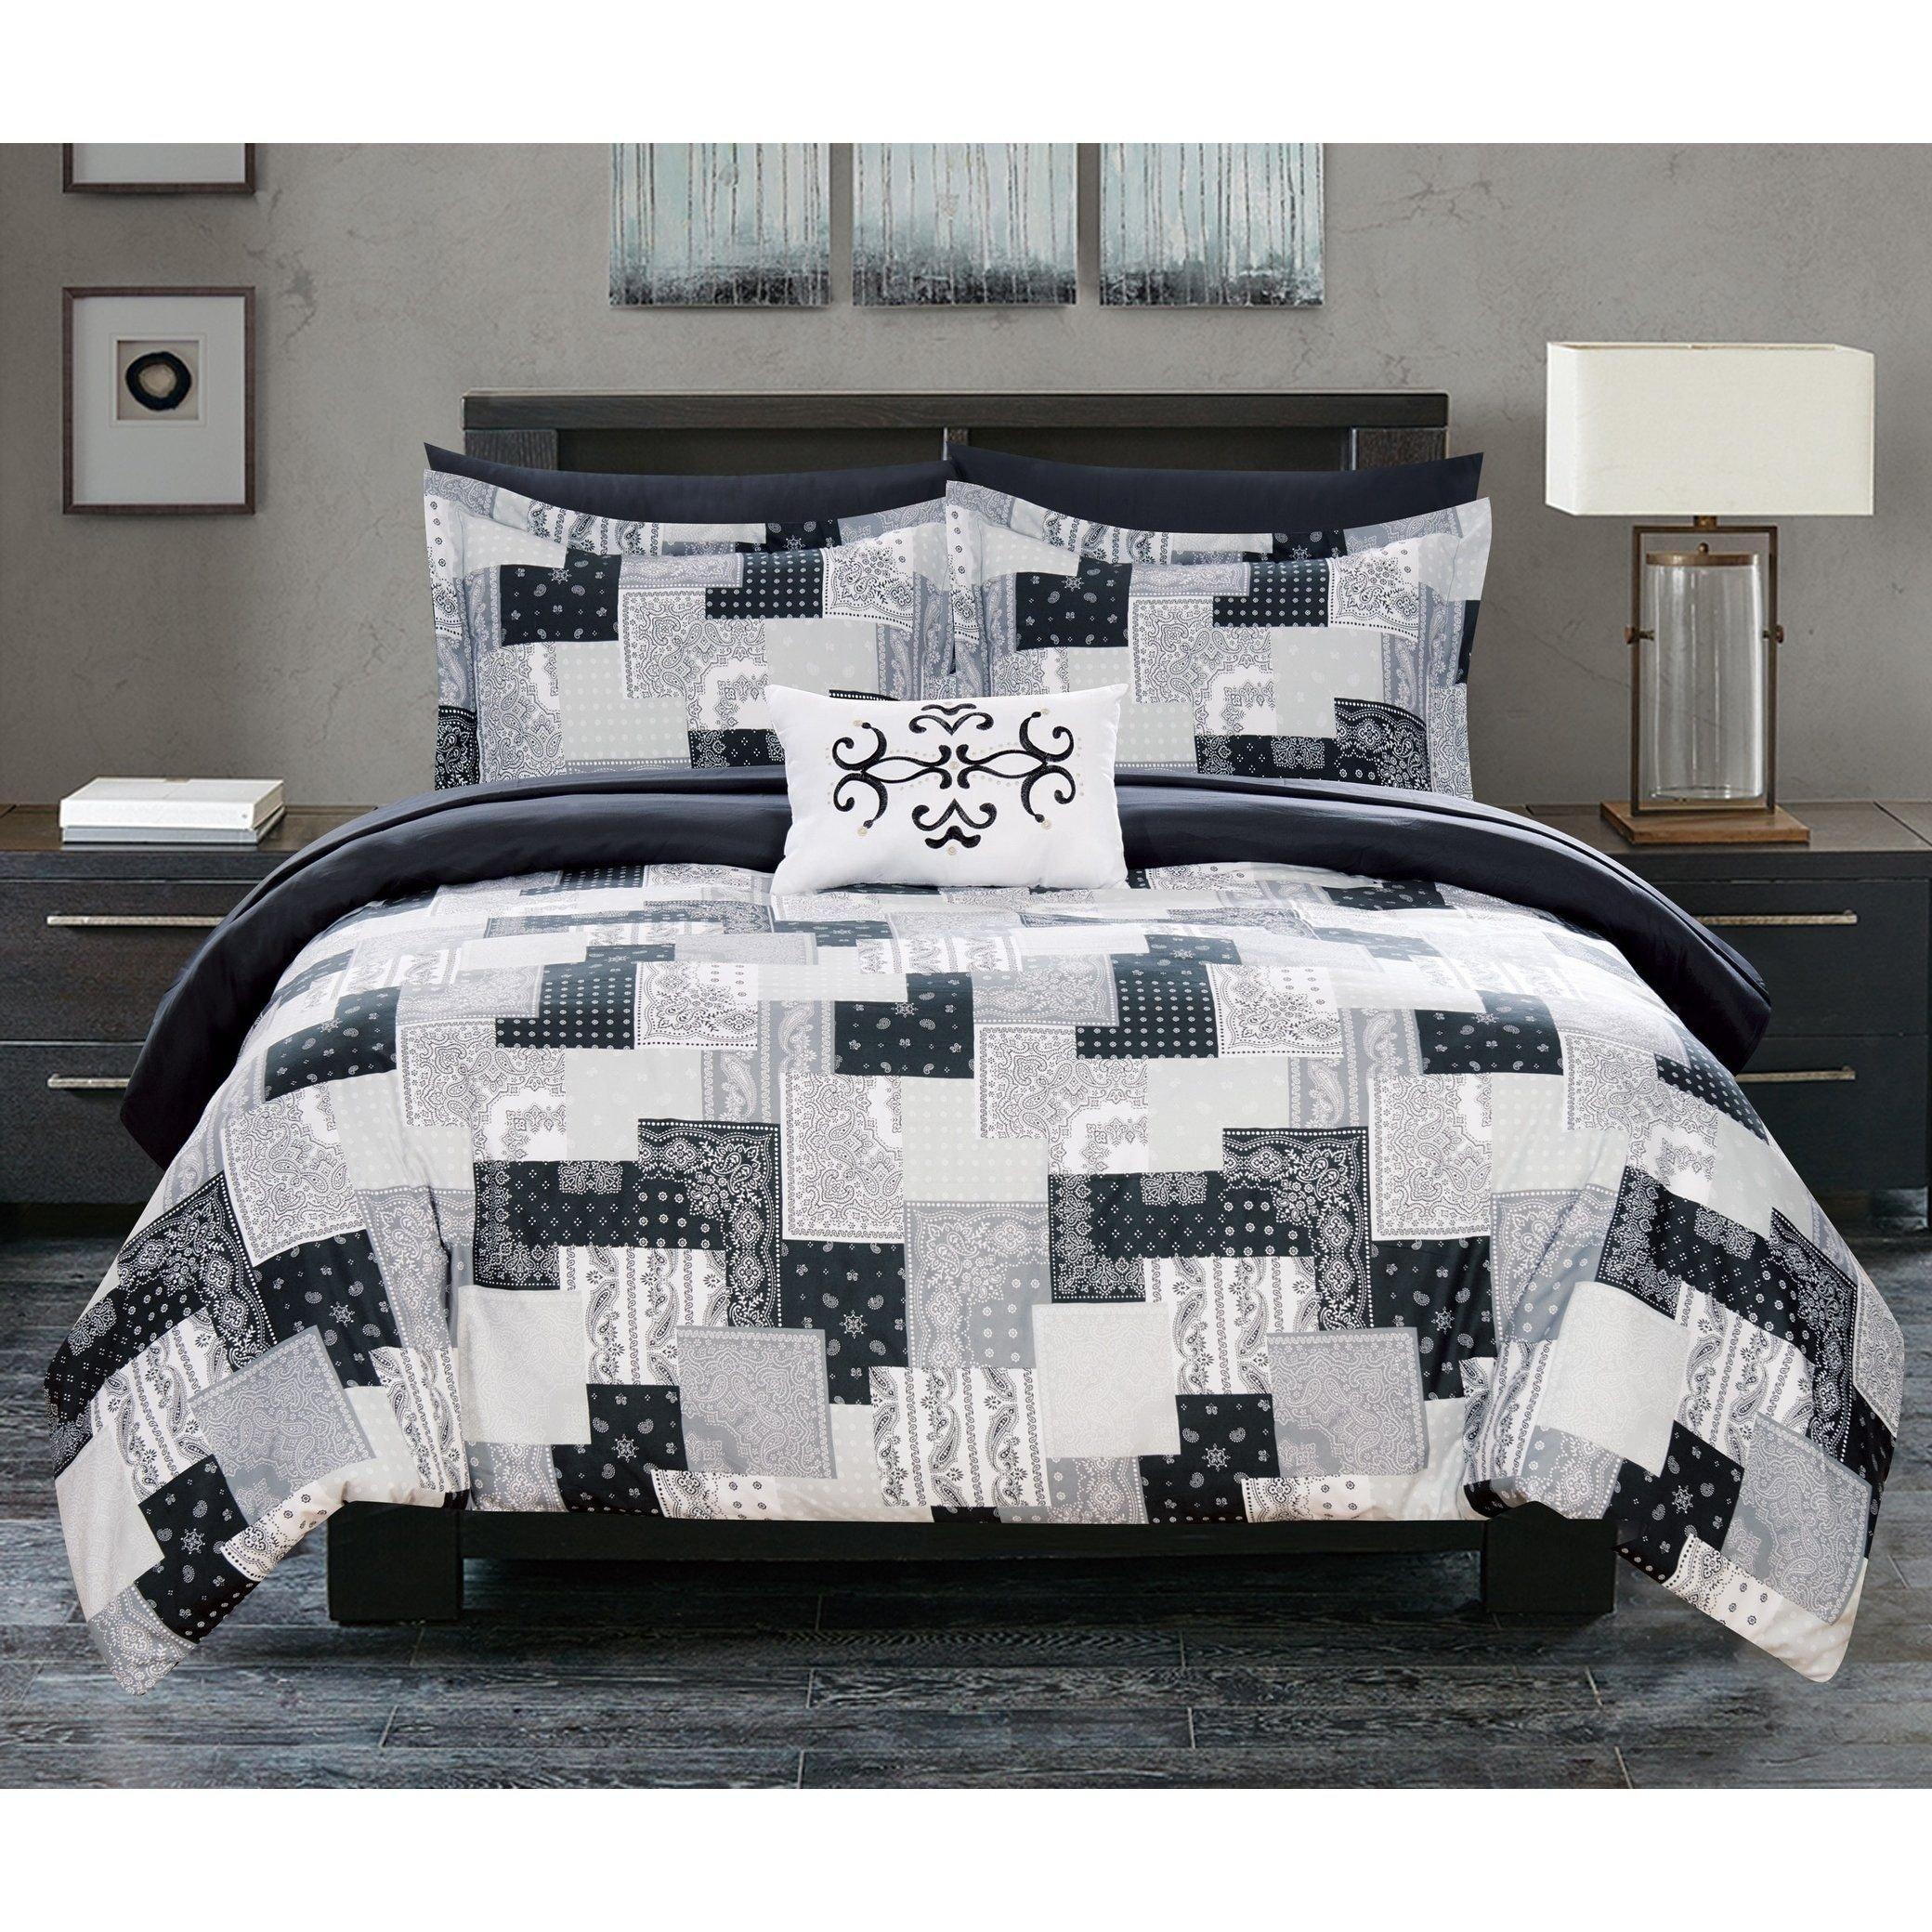 Black Bedroom Comforter Set Elegant Chic Home 8 Piece Reversible forter Set Patchwork Paisley